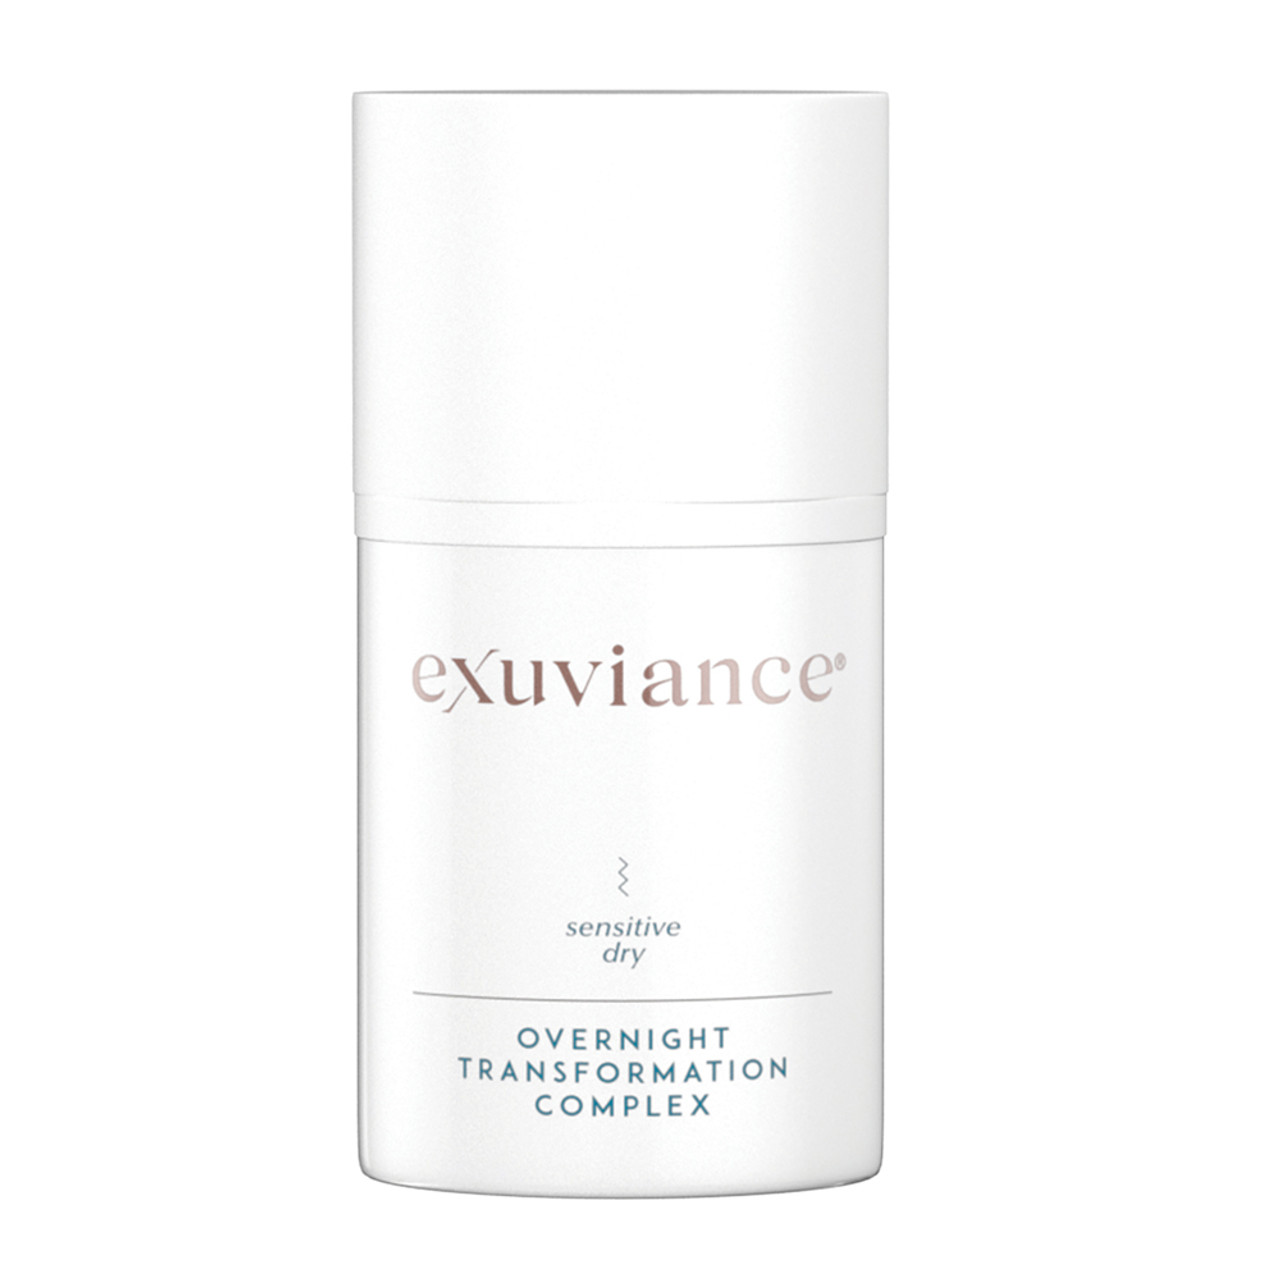 Exuviance Overnight Transformation Complex